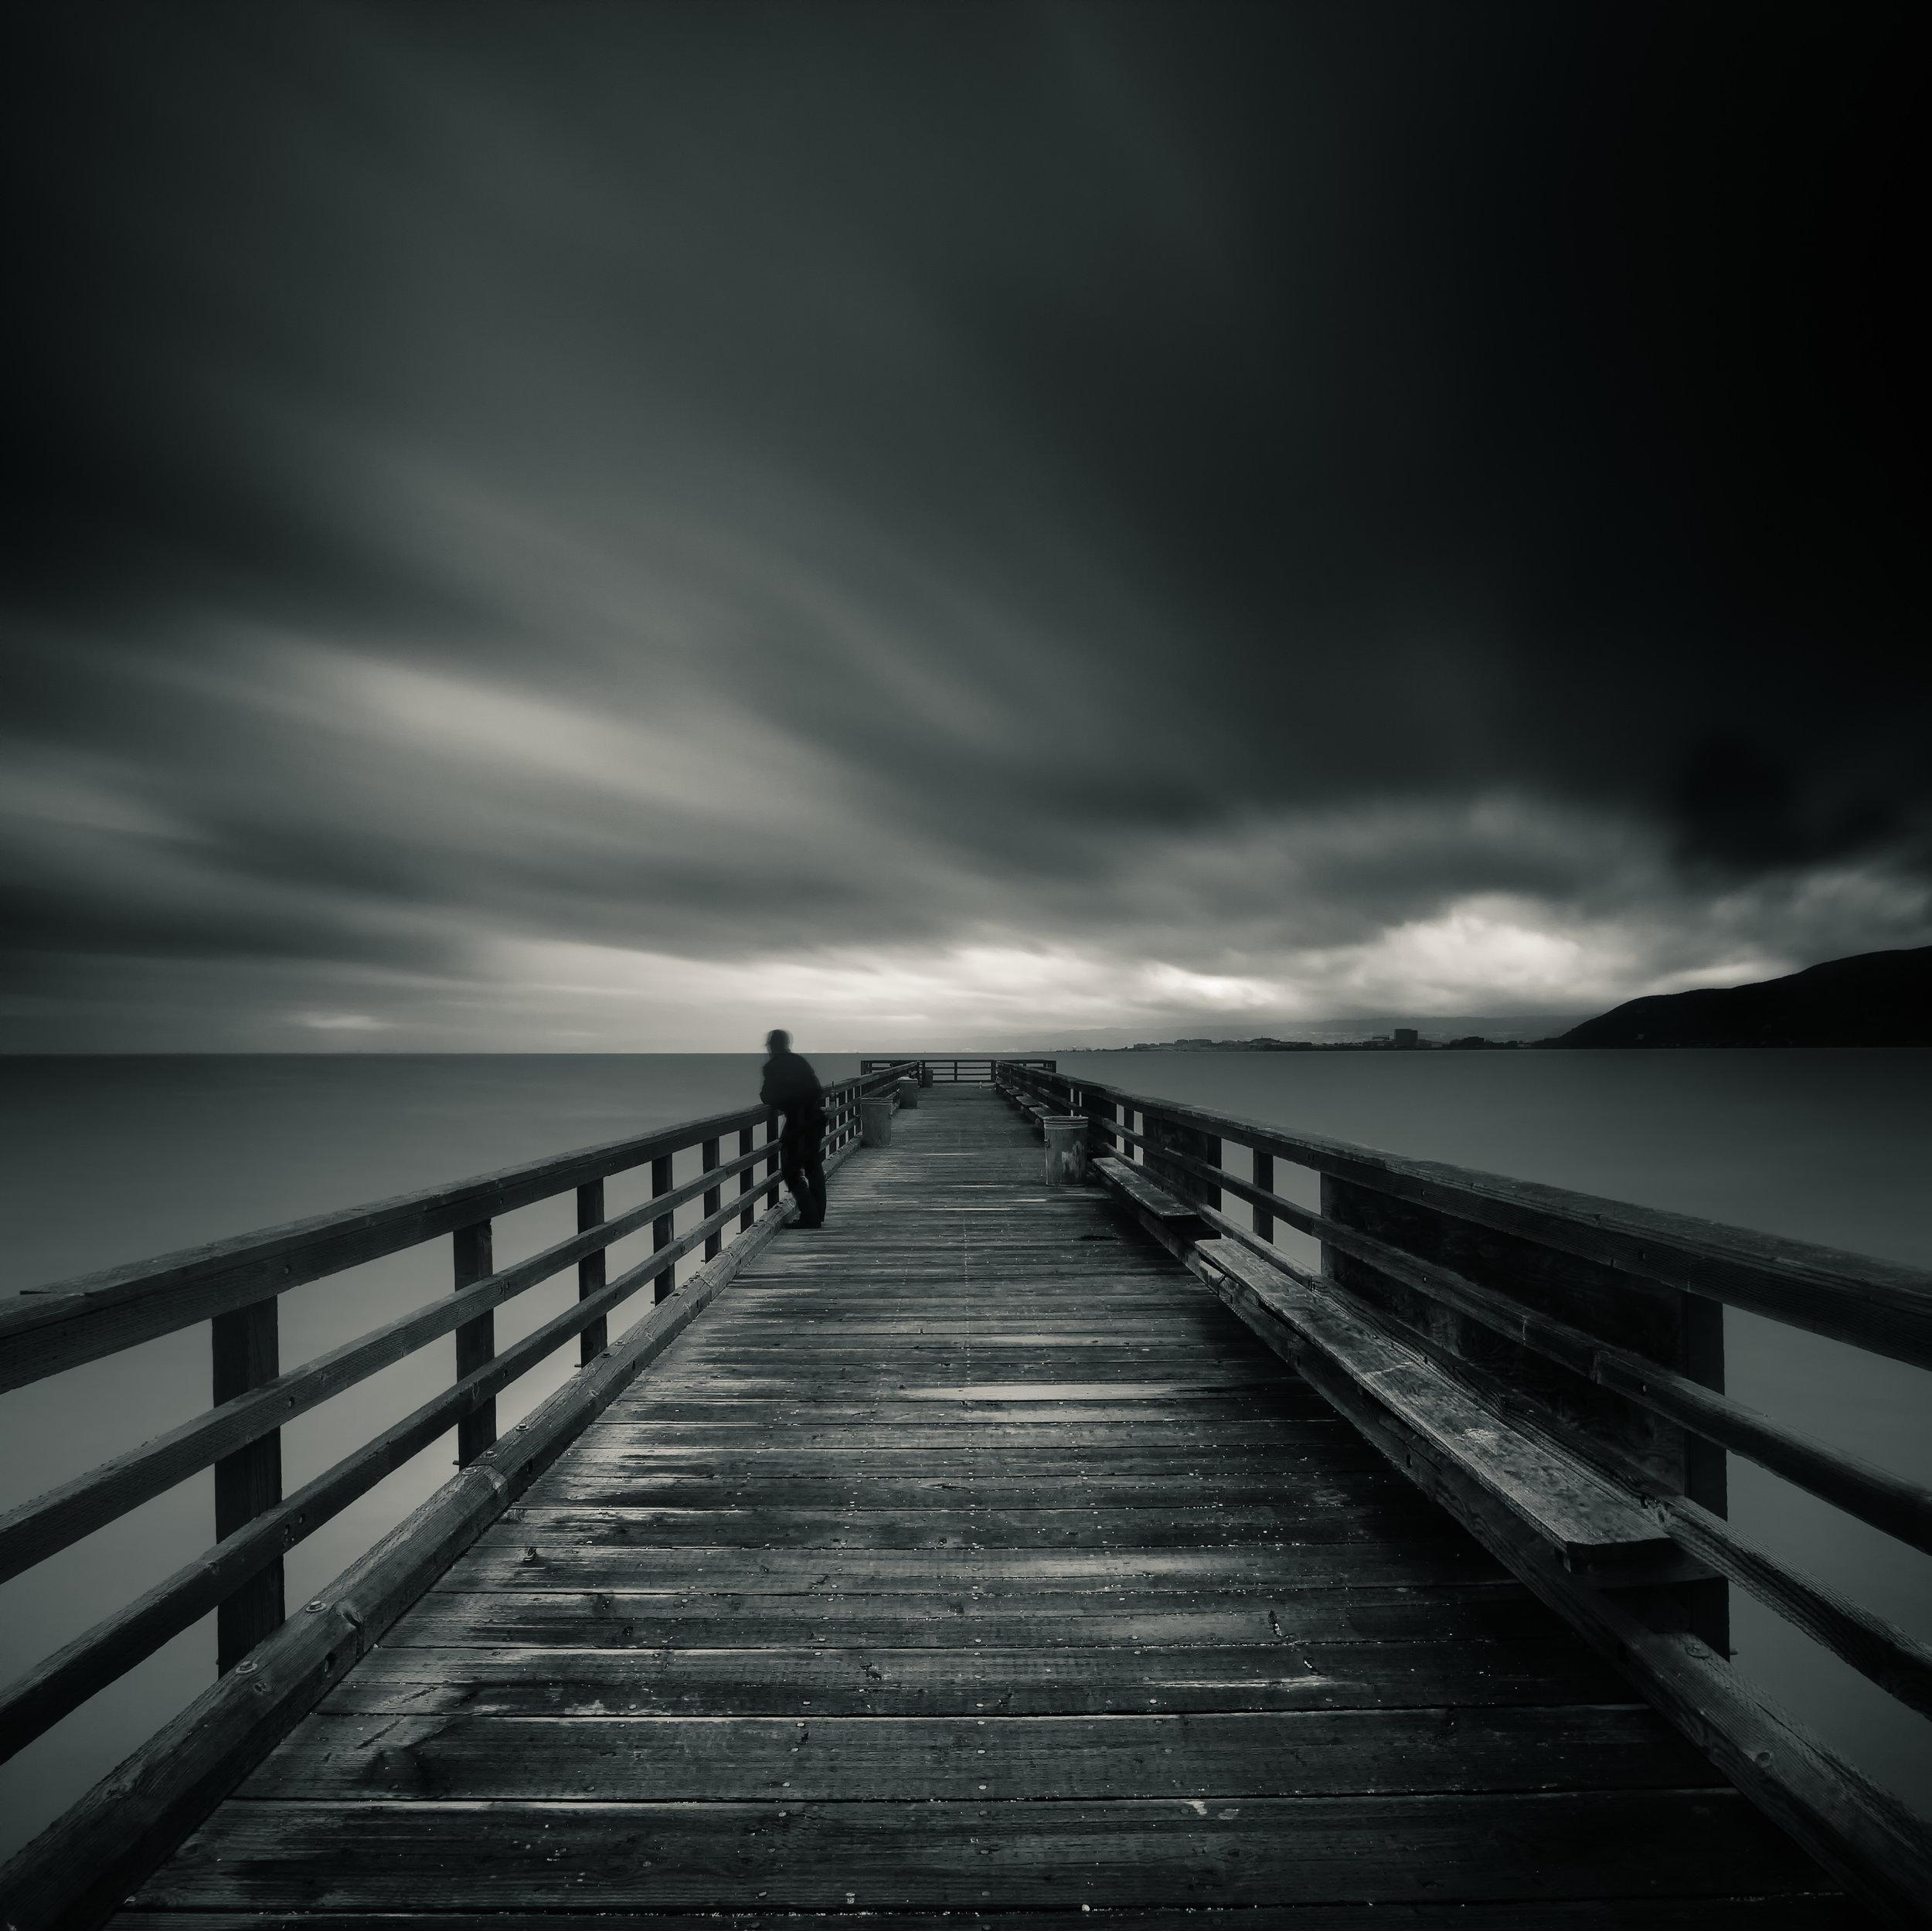 South San Francisco black white candlestick pier lone figure storm clouds